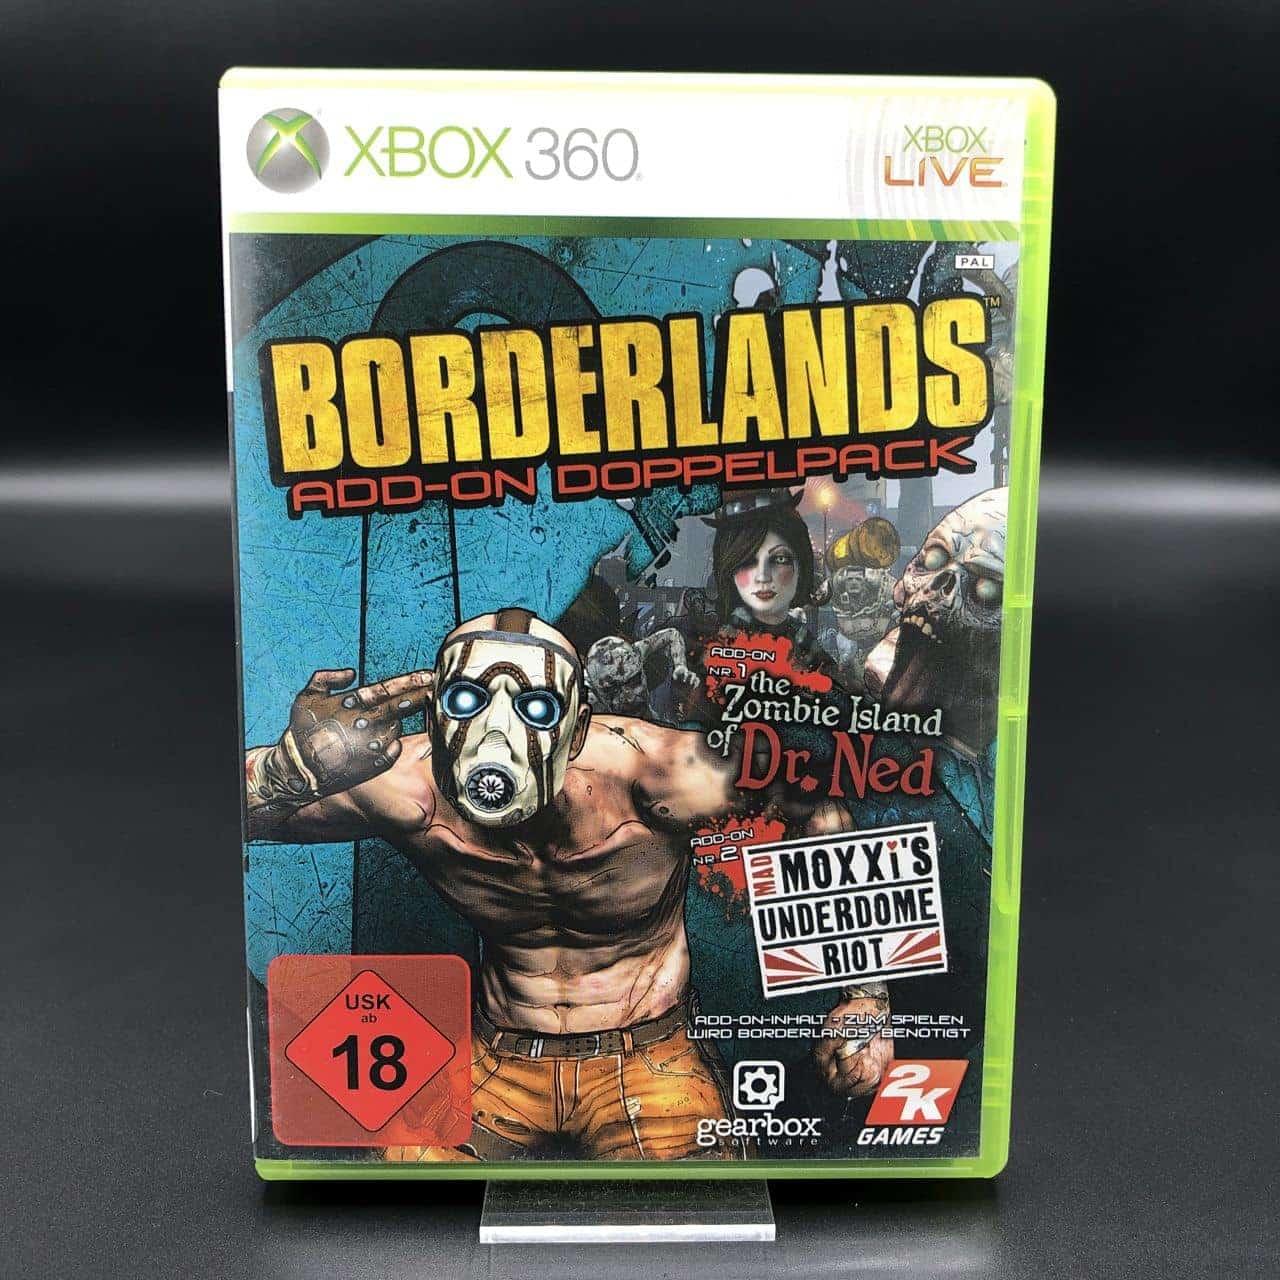 Borderlands Add-On Doppelpack (Komplett) (Sehr gut) Xbox 360 (FSK18)